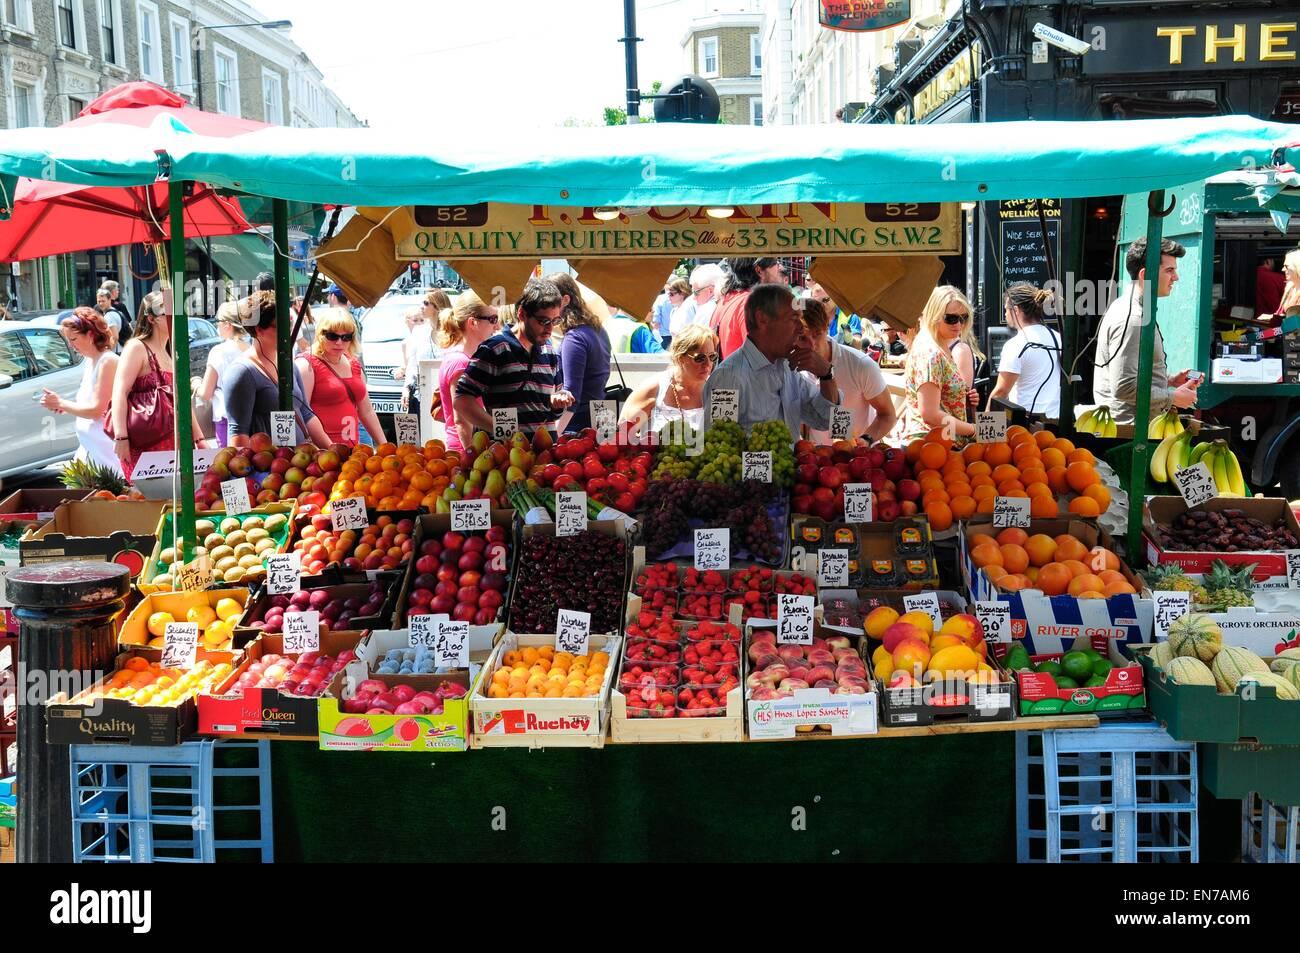 Fruit Market Stall, Portobello Road, Notting Hill, London, England, UK - Stock Image